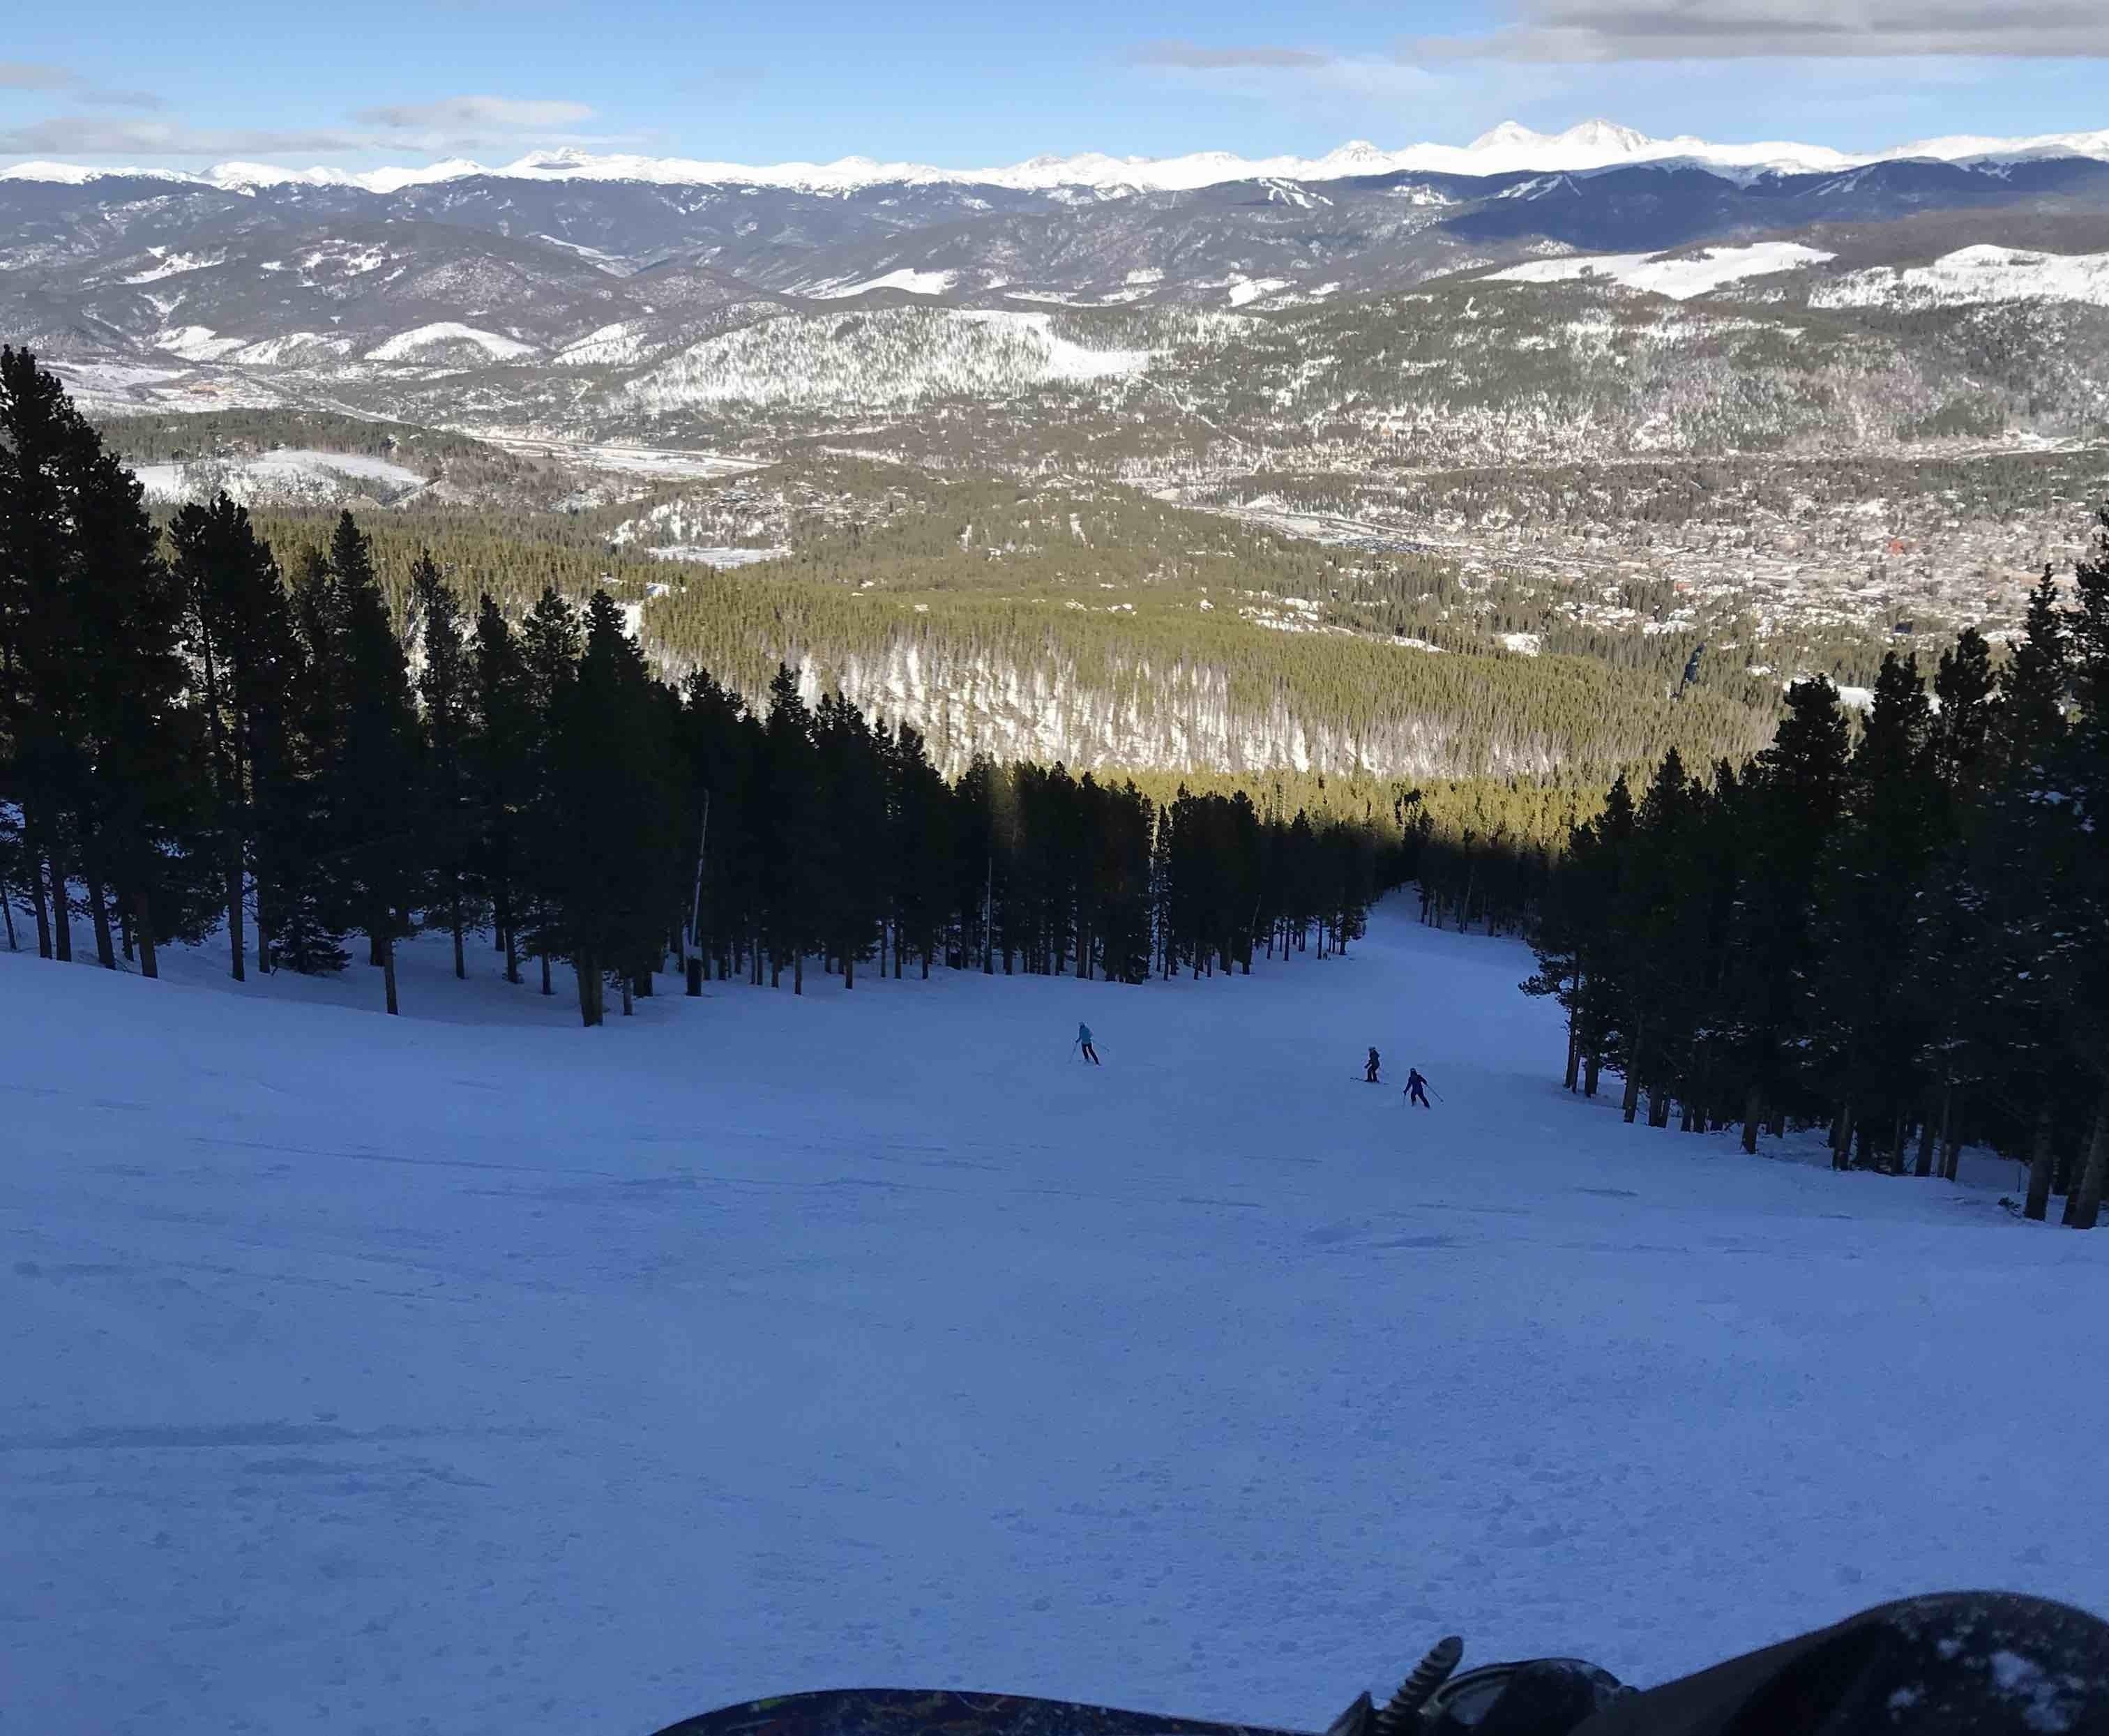 Peak 8, Breckenridge, Colorado, United States of America